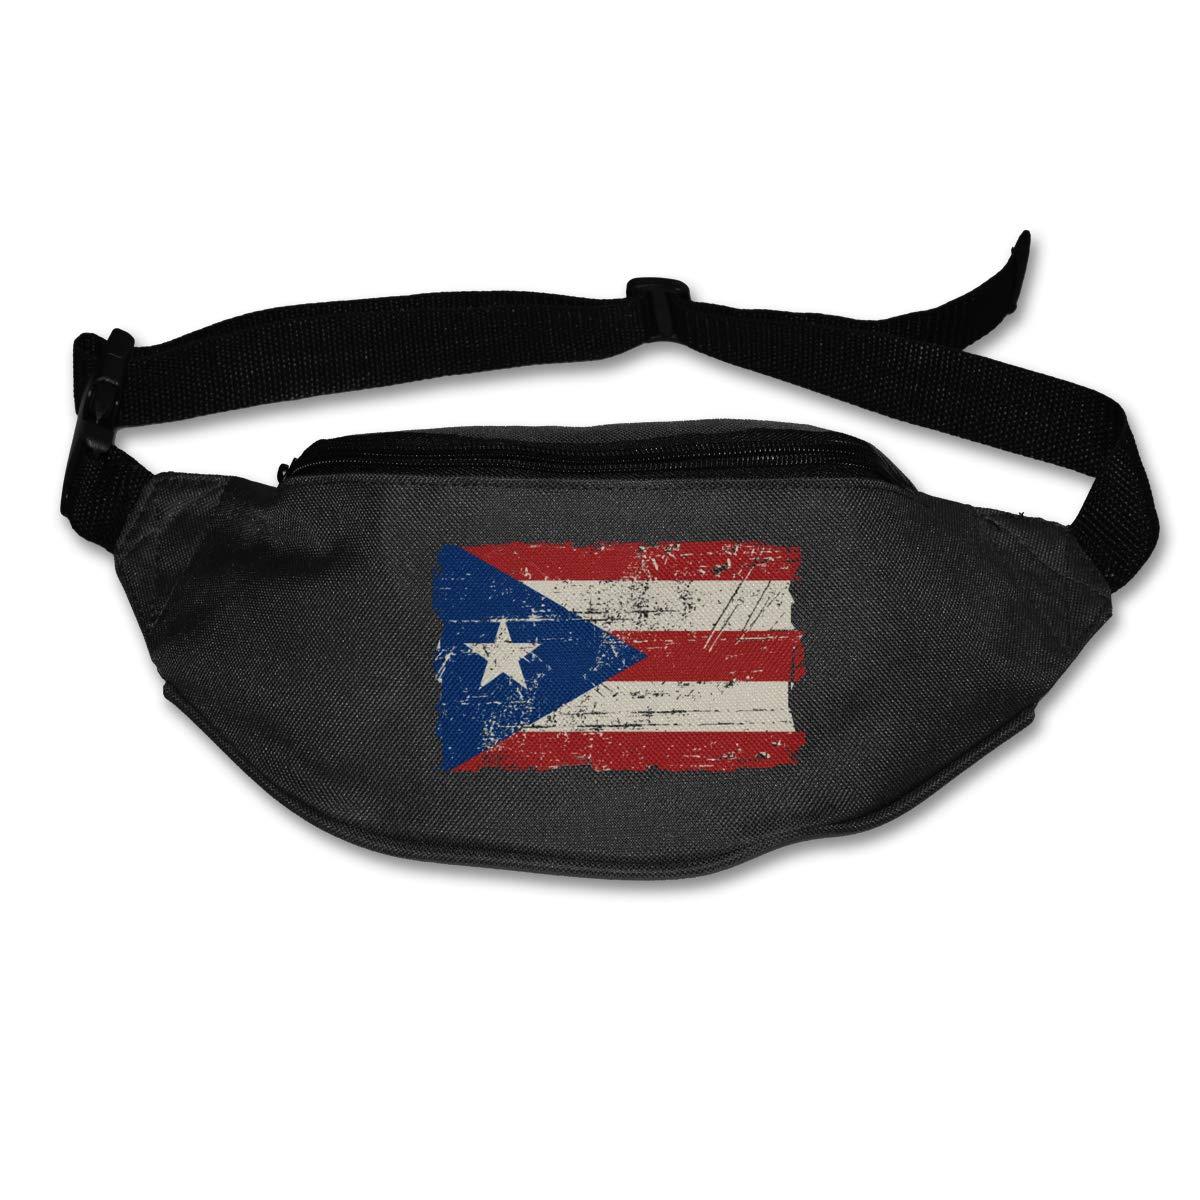 Retro Puerto Rico Flag Sport Waist Packs Fanny Pack Adjustable For Travel